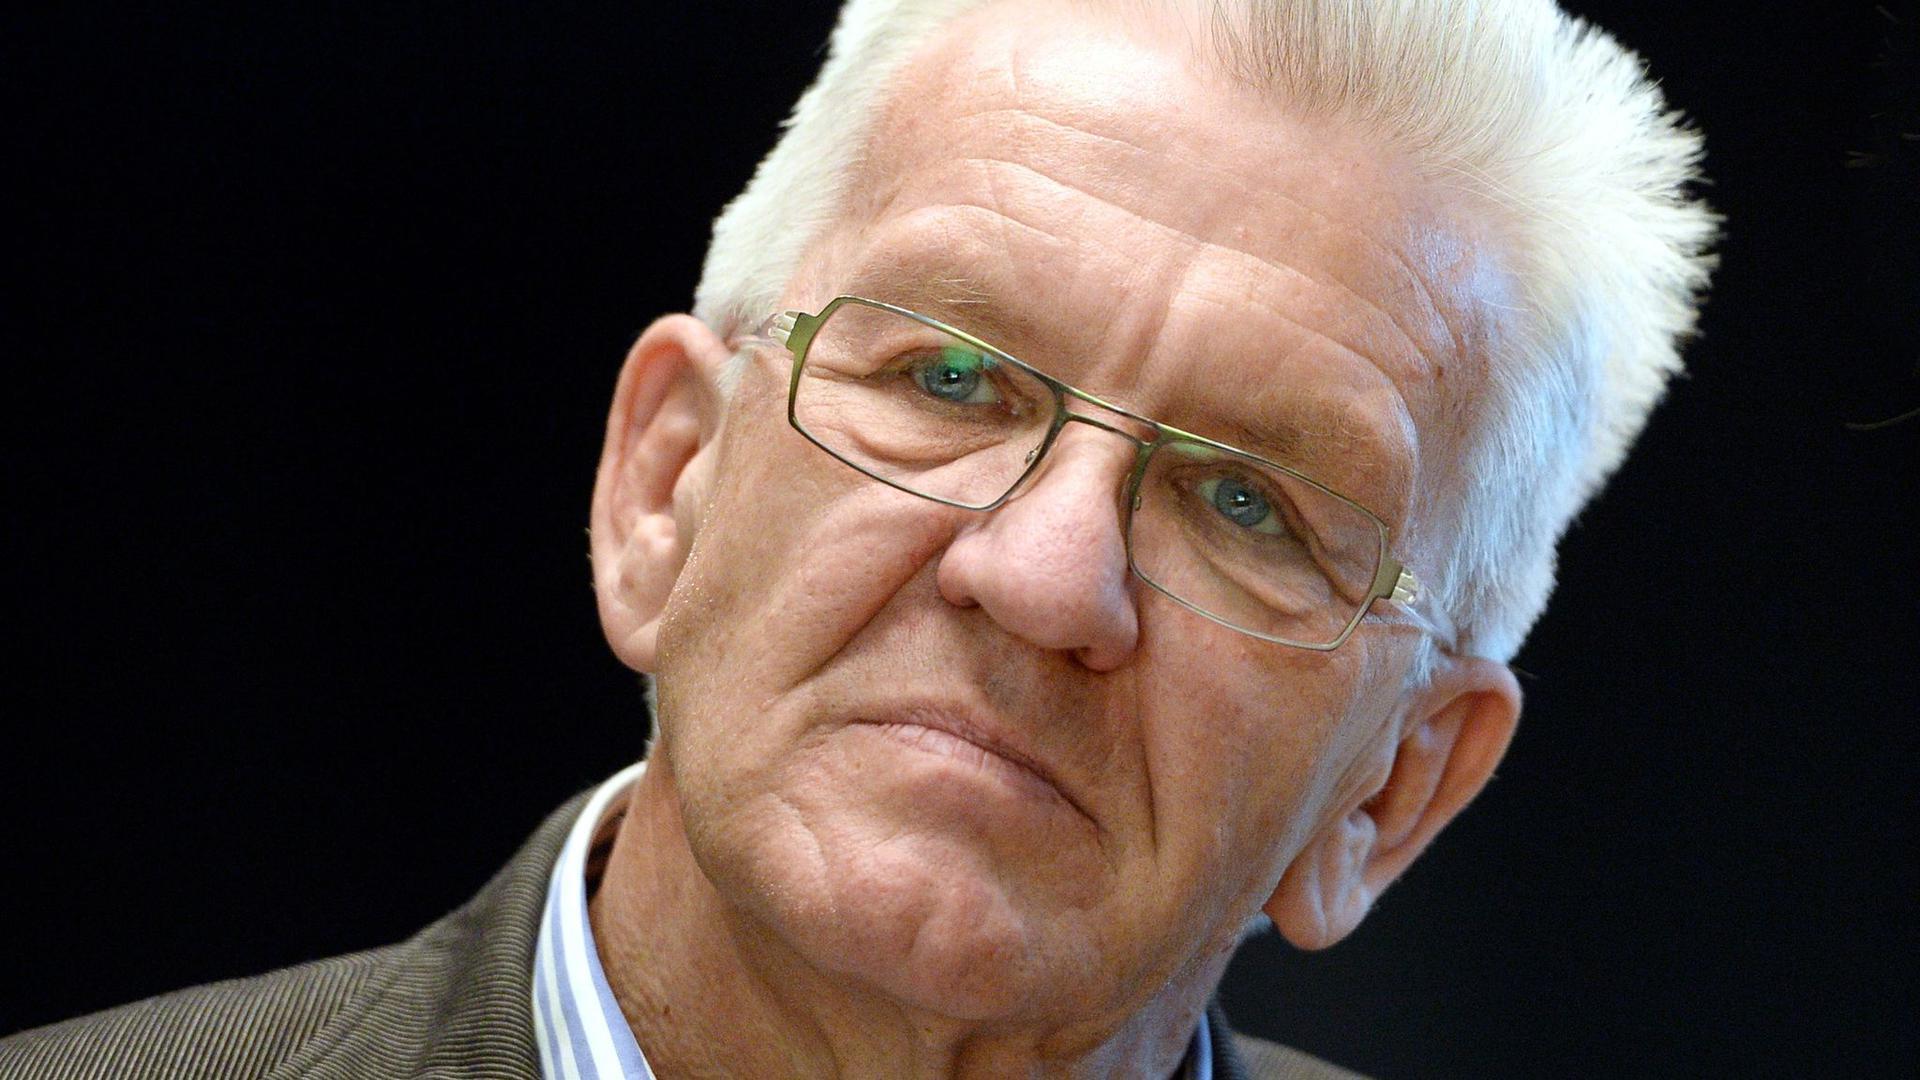 Winfried Kretschmann (Bündnis 90/Die Grünen) bei einer Veranstaltung.